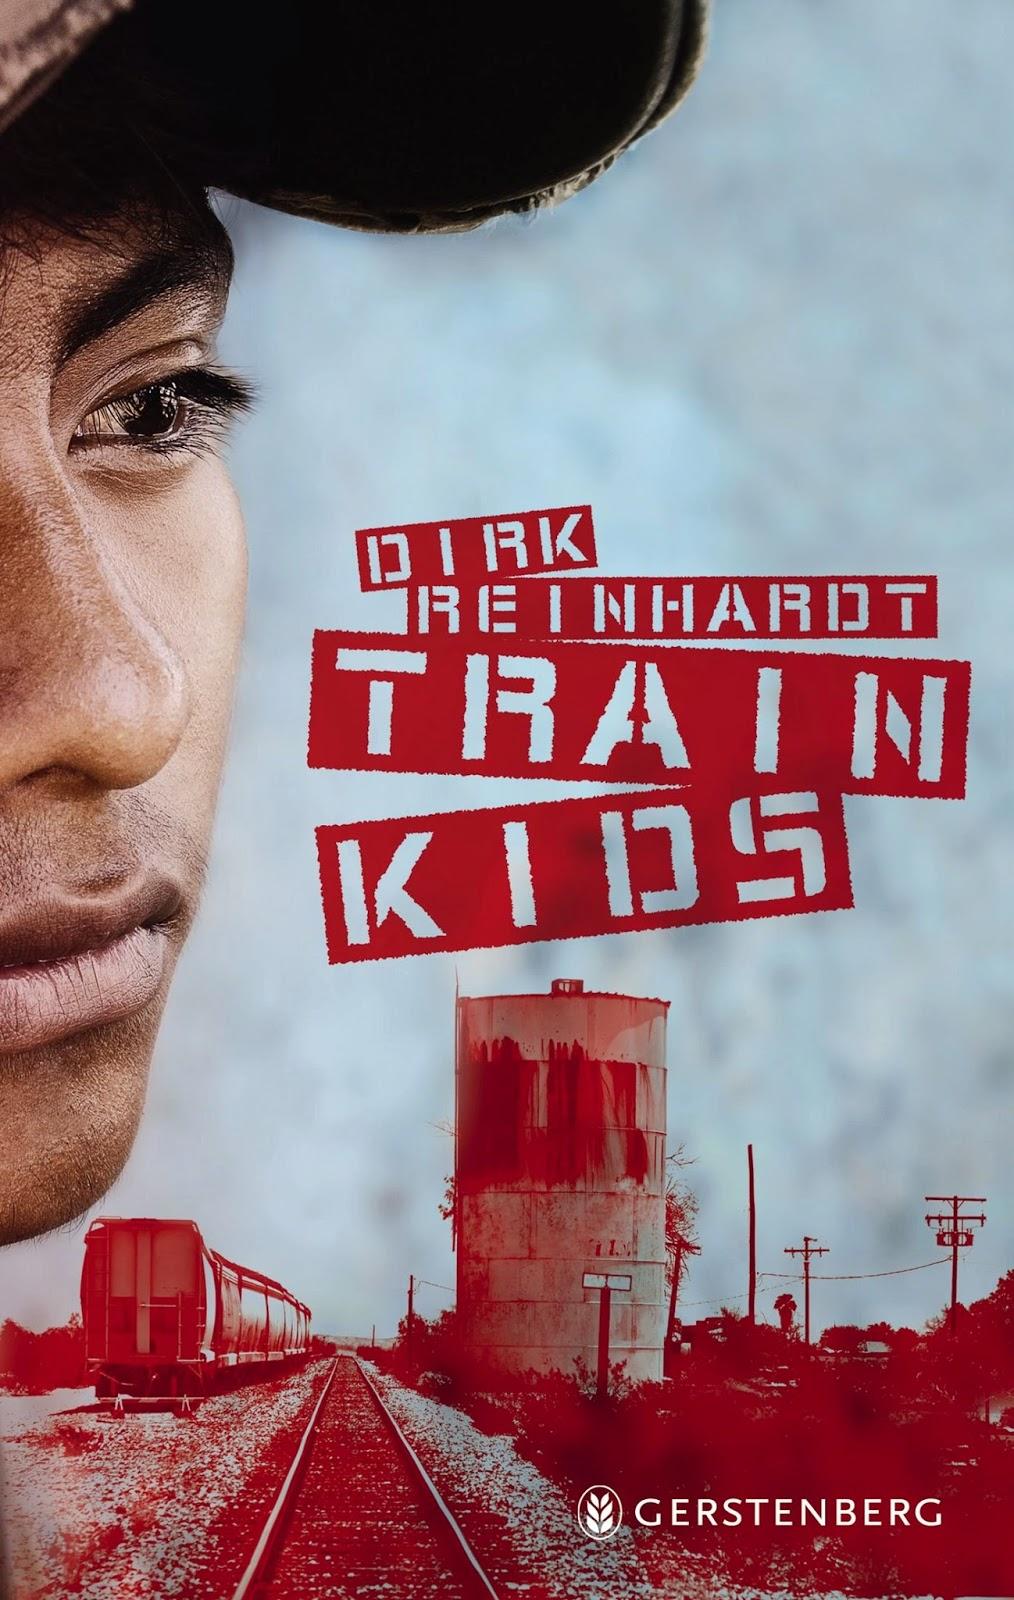 http://www.amazon.de/Train-Kids-Dirk-Reinhardt/dp/3836958007/ref=sr_1_1_twi_1?ie=UTF8&qid=1422113817&sr=8-1&keywords=Train+Kids